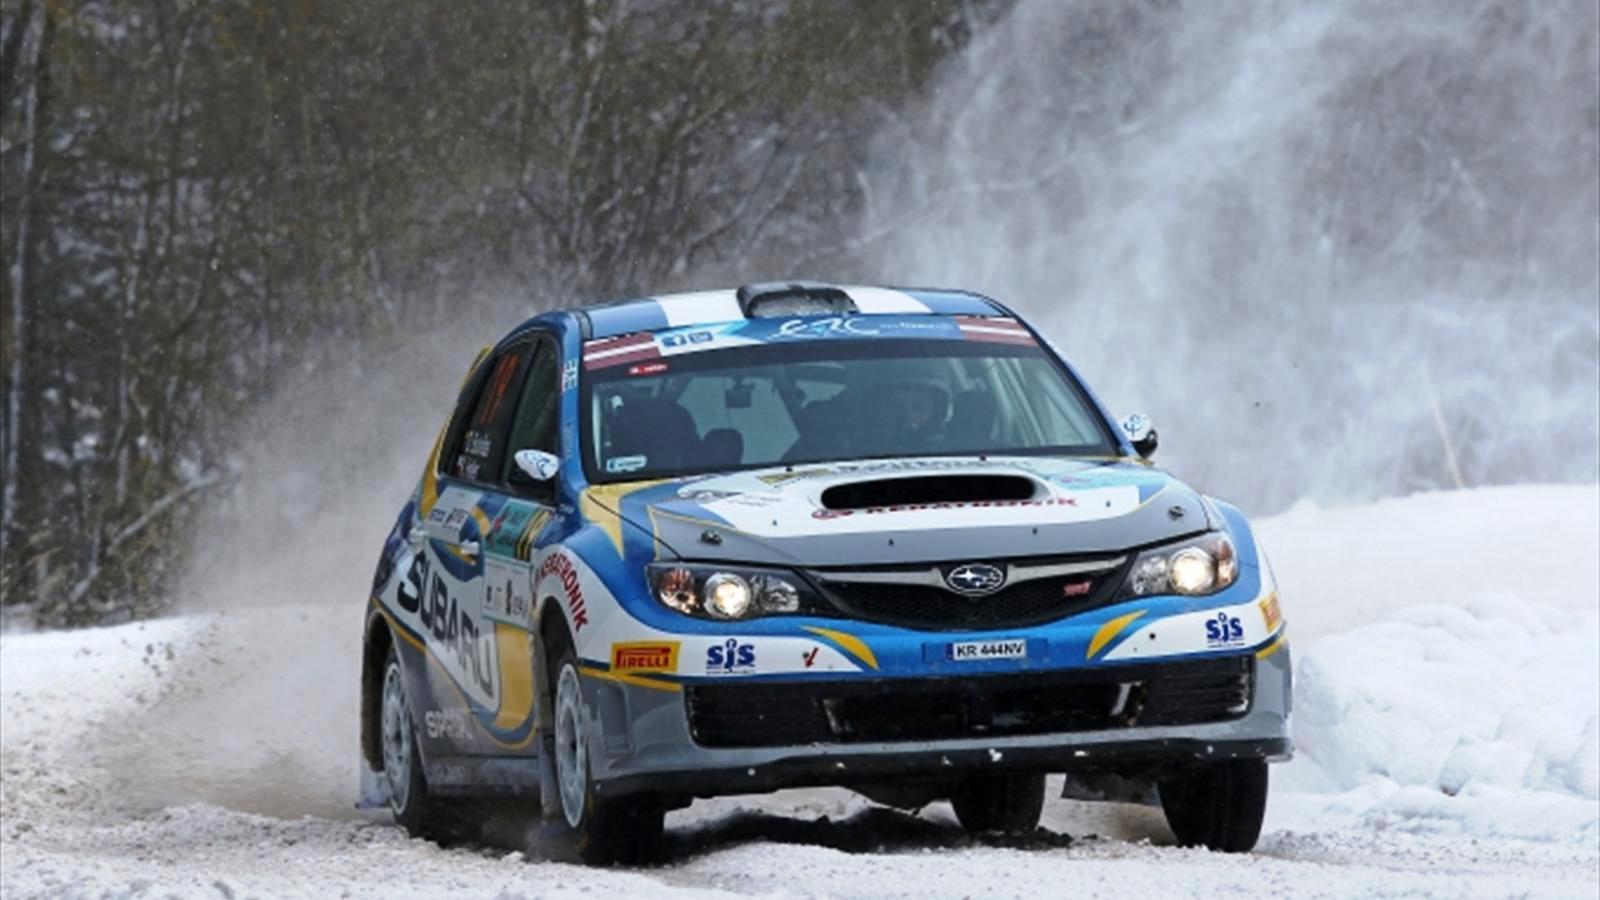 Impreza Body Cover Mobil Toyota Hardtop Abu abu · Impreza . Source · Subaru Poland Rally Team commits to full Erc programme